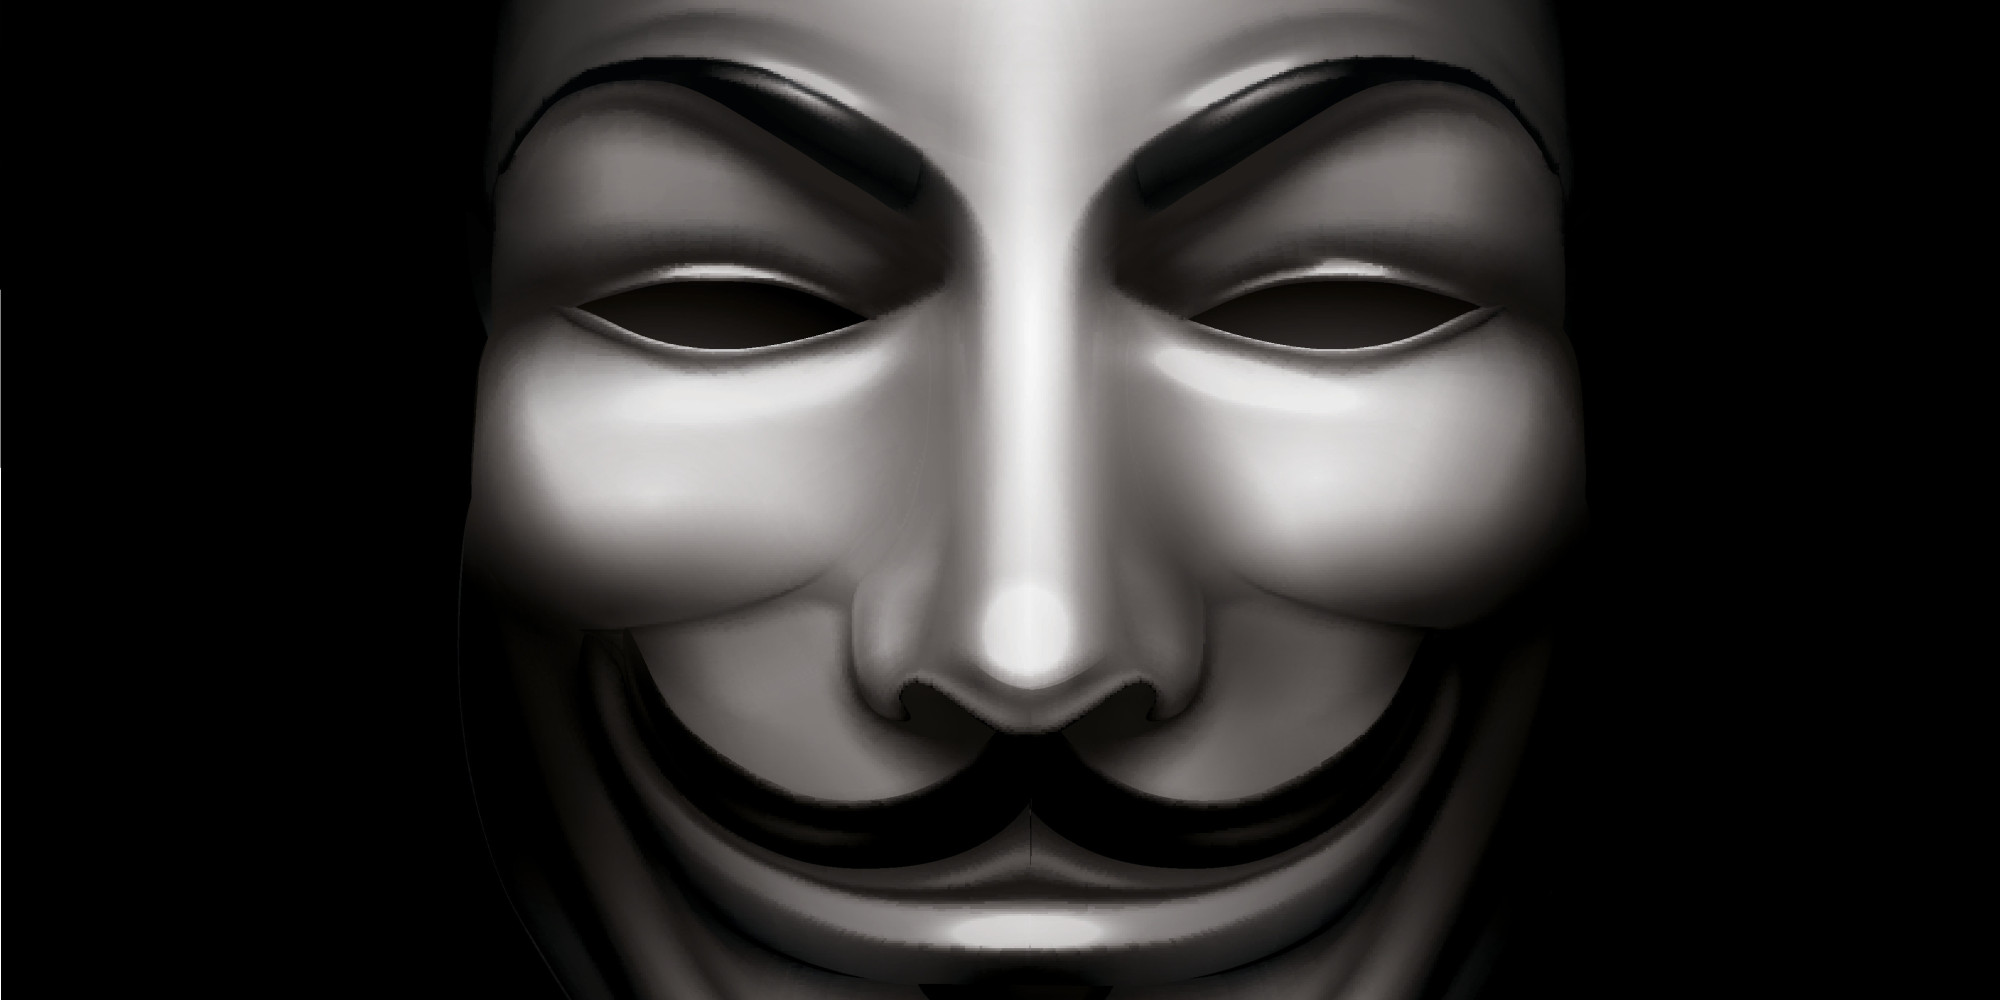 anonymous meldet gro223en erfolg quothaben terroranschlag des